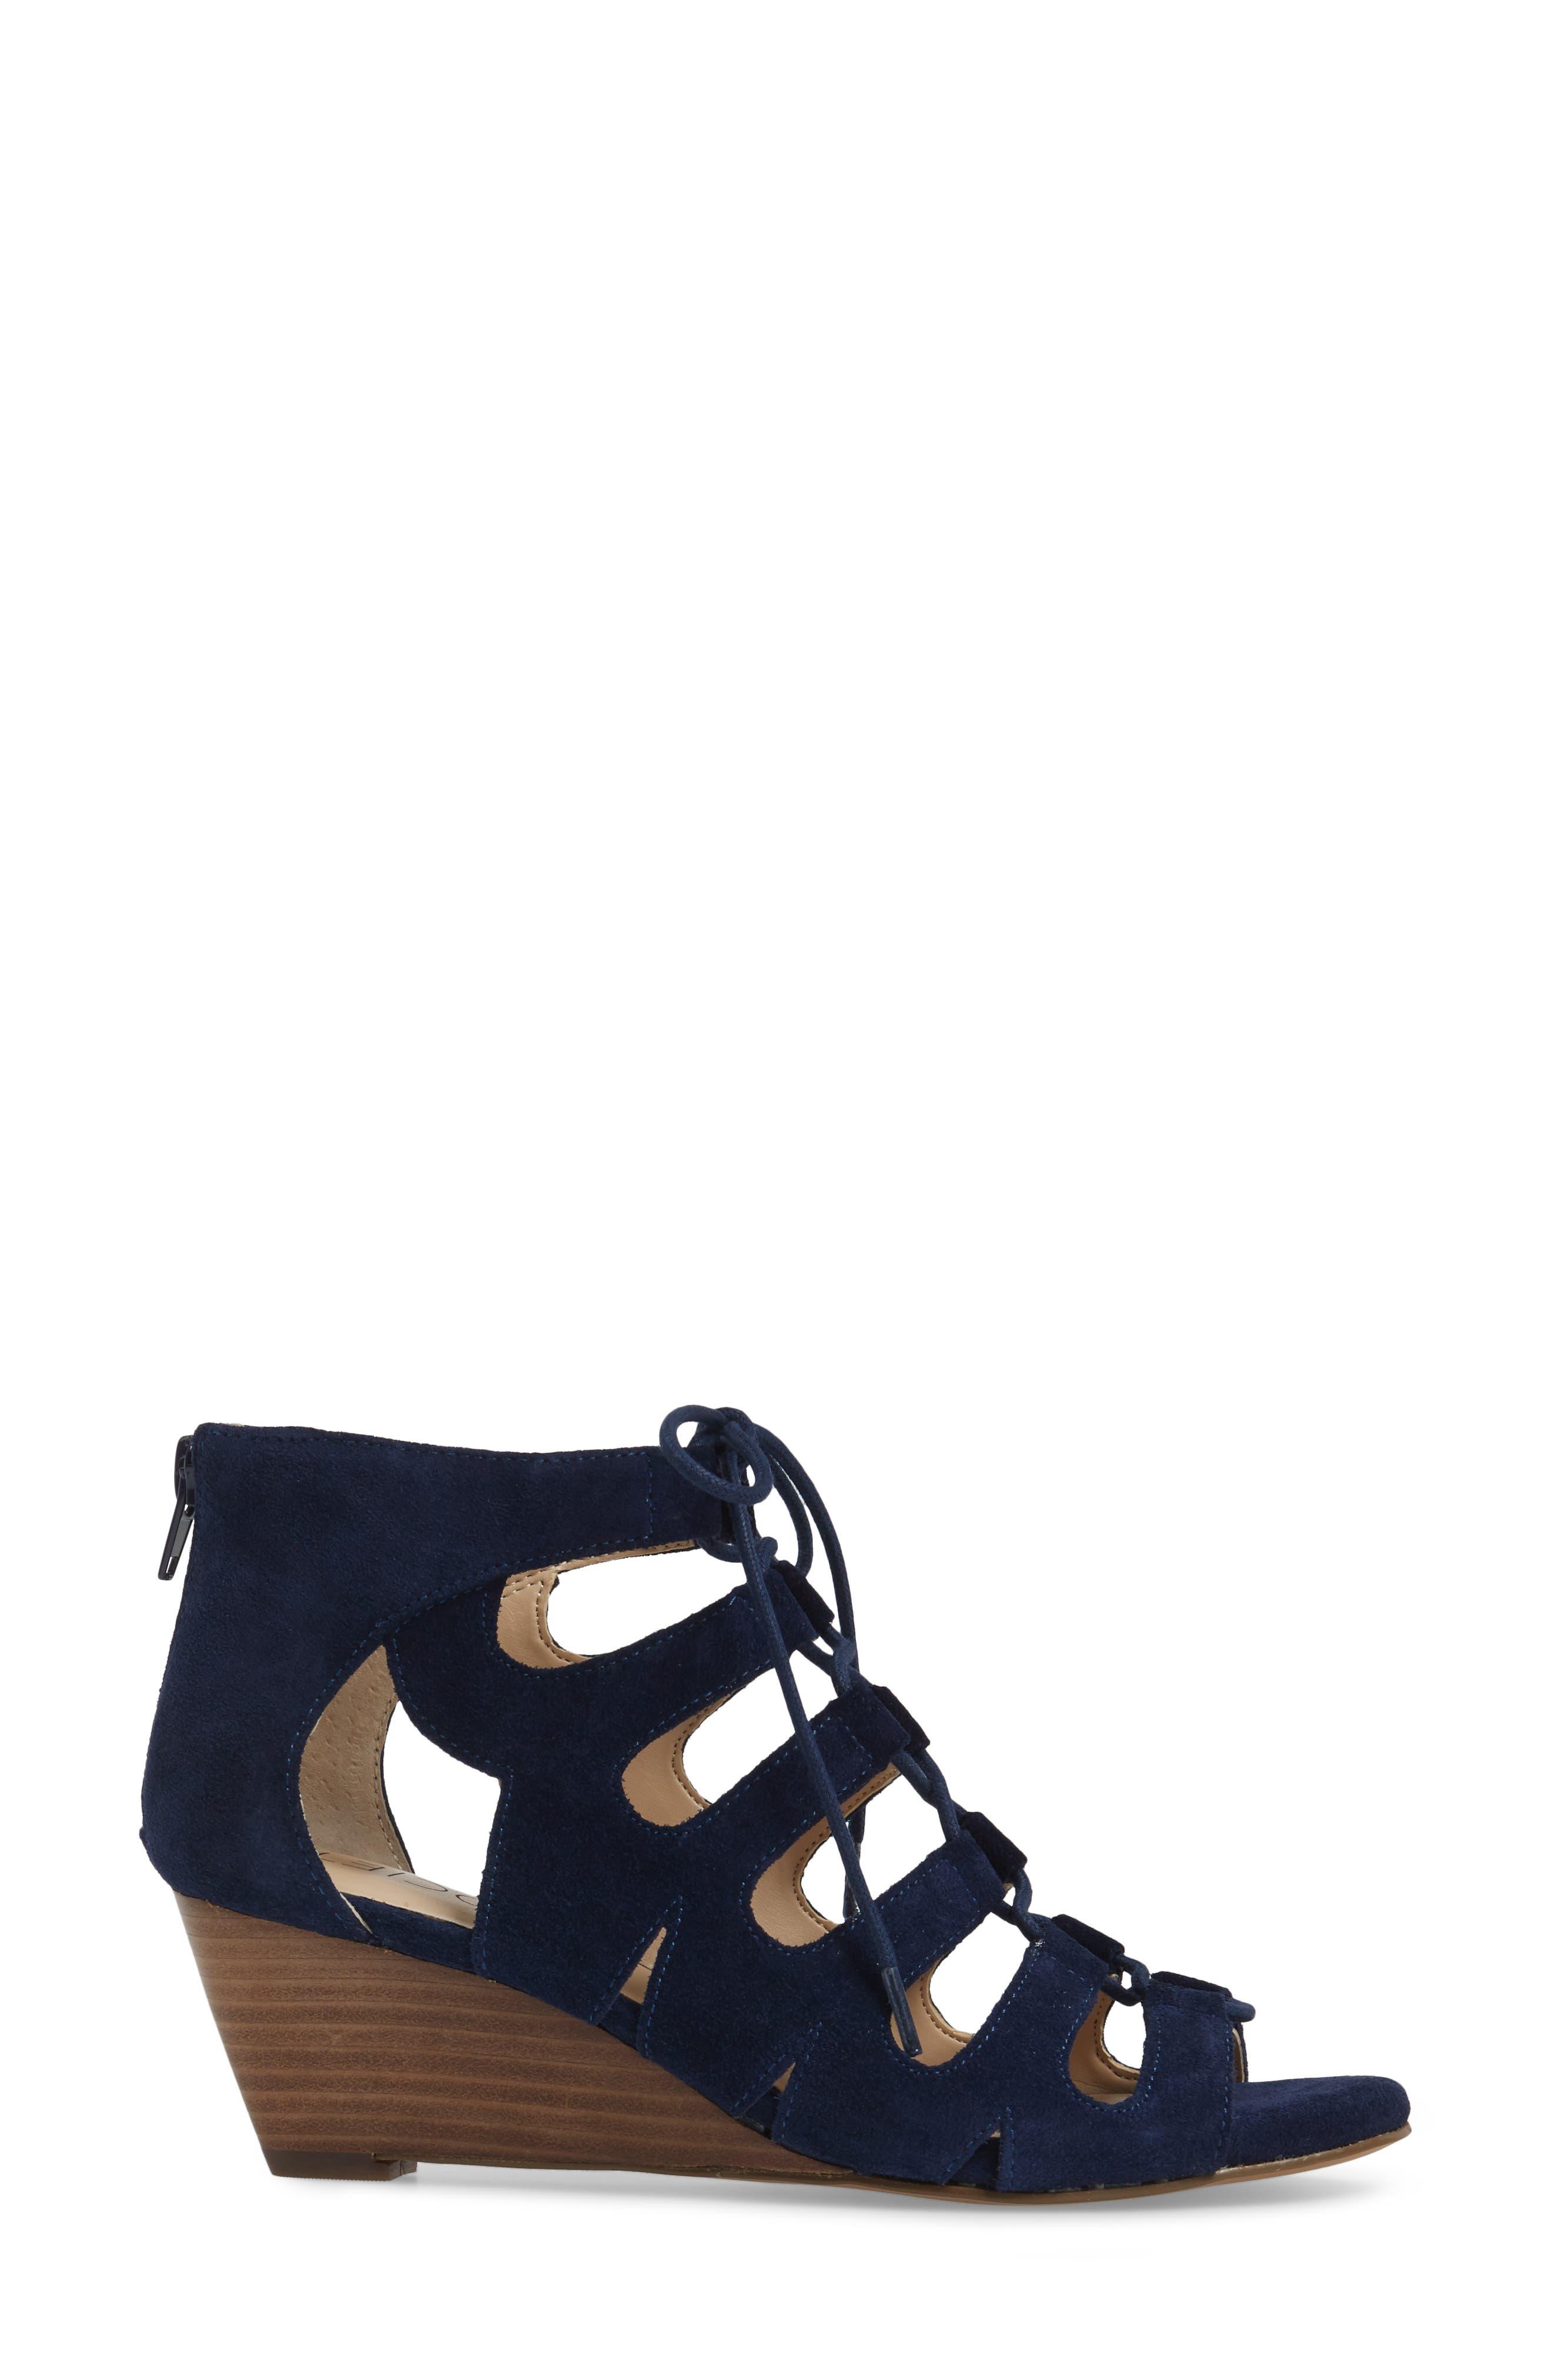 'Freyaa' Wedge Sandal,                             Alternate thumbnail 3, color,                             Navy Suede